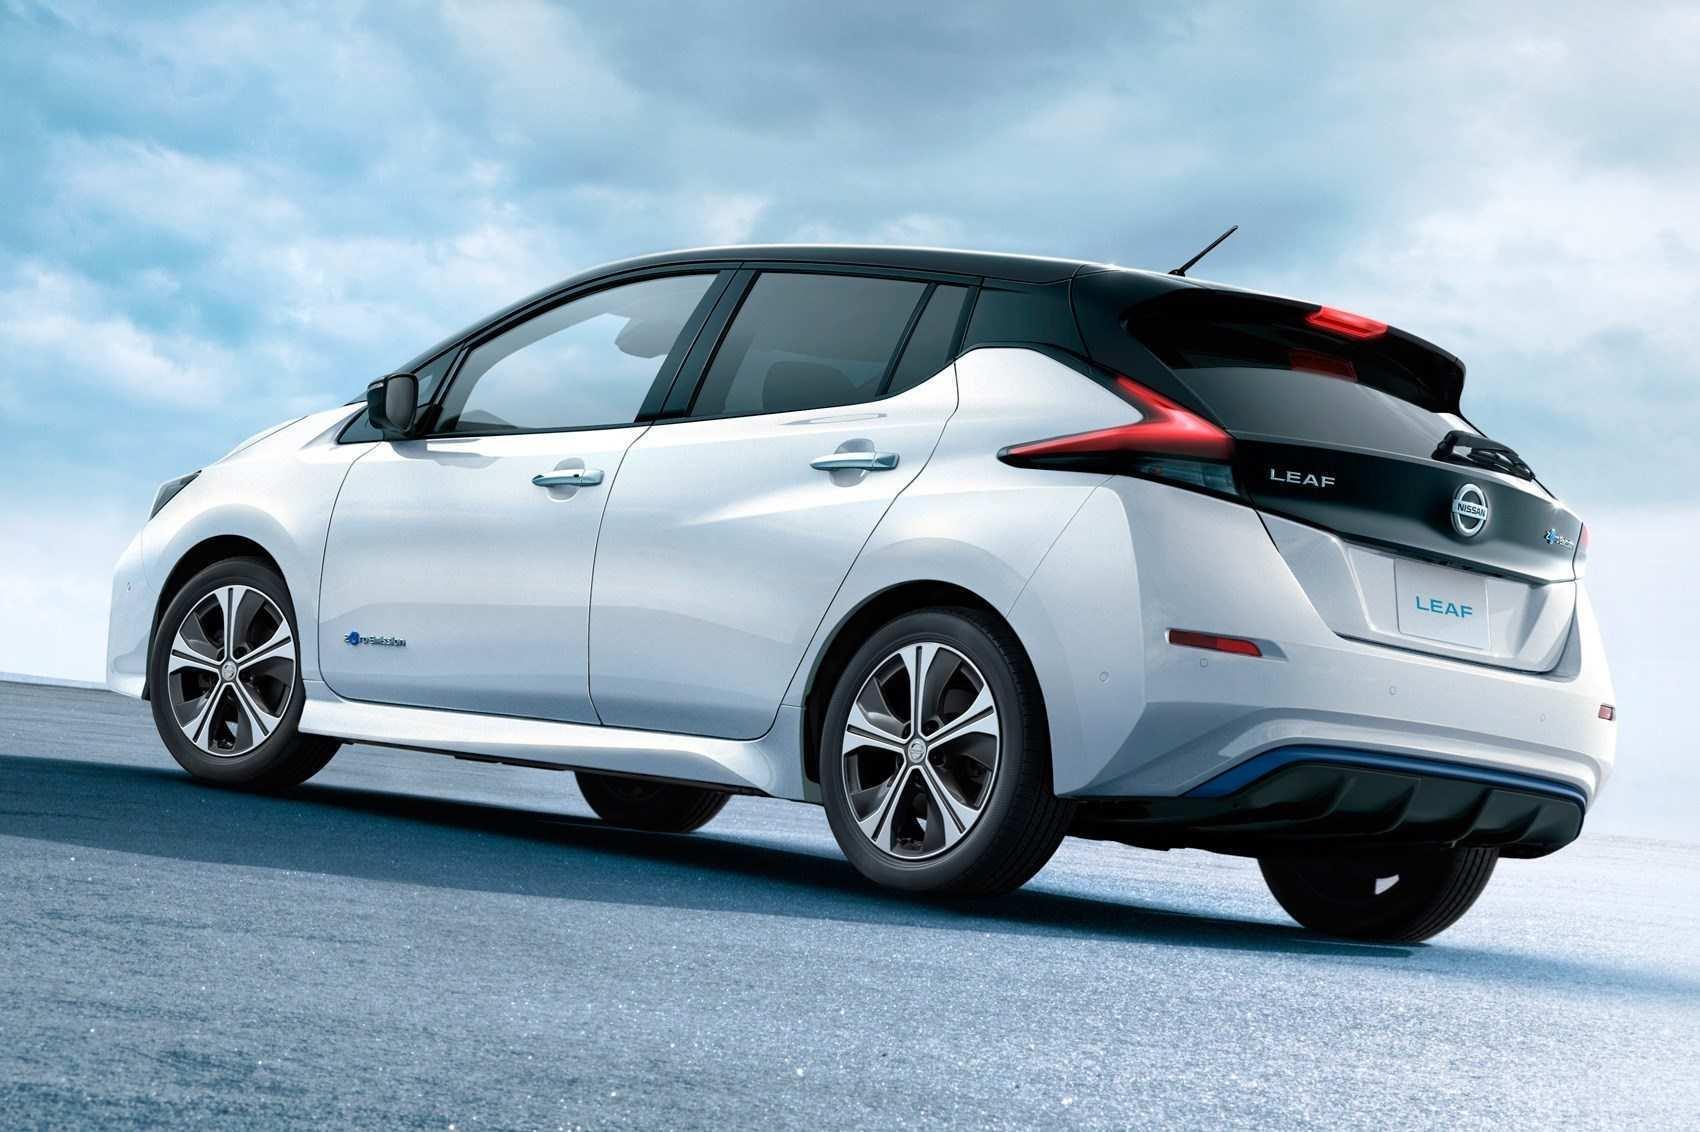 67 New 2020 Nissan Leaf E Plus Release by 2020 Nissan Leaf E Plus